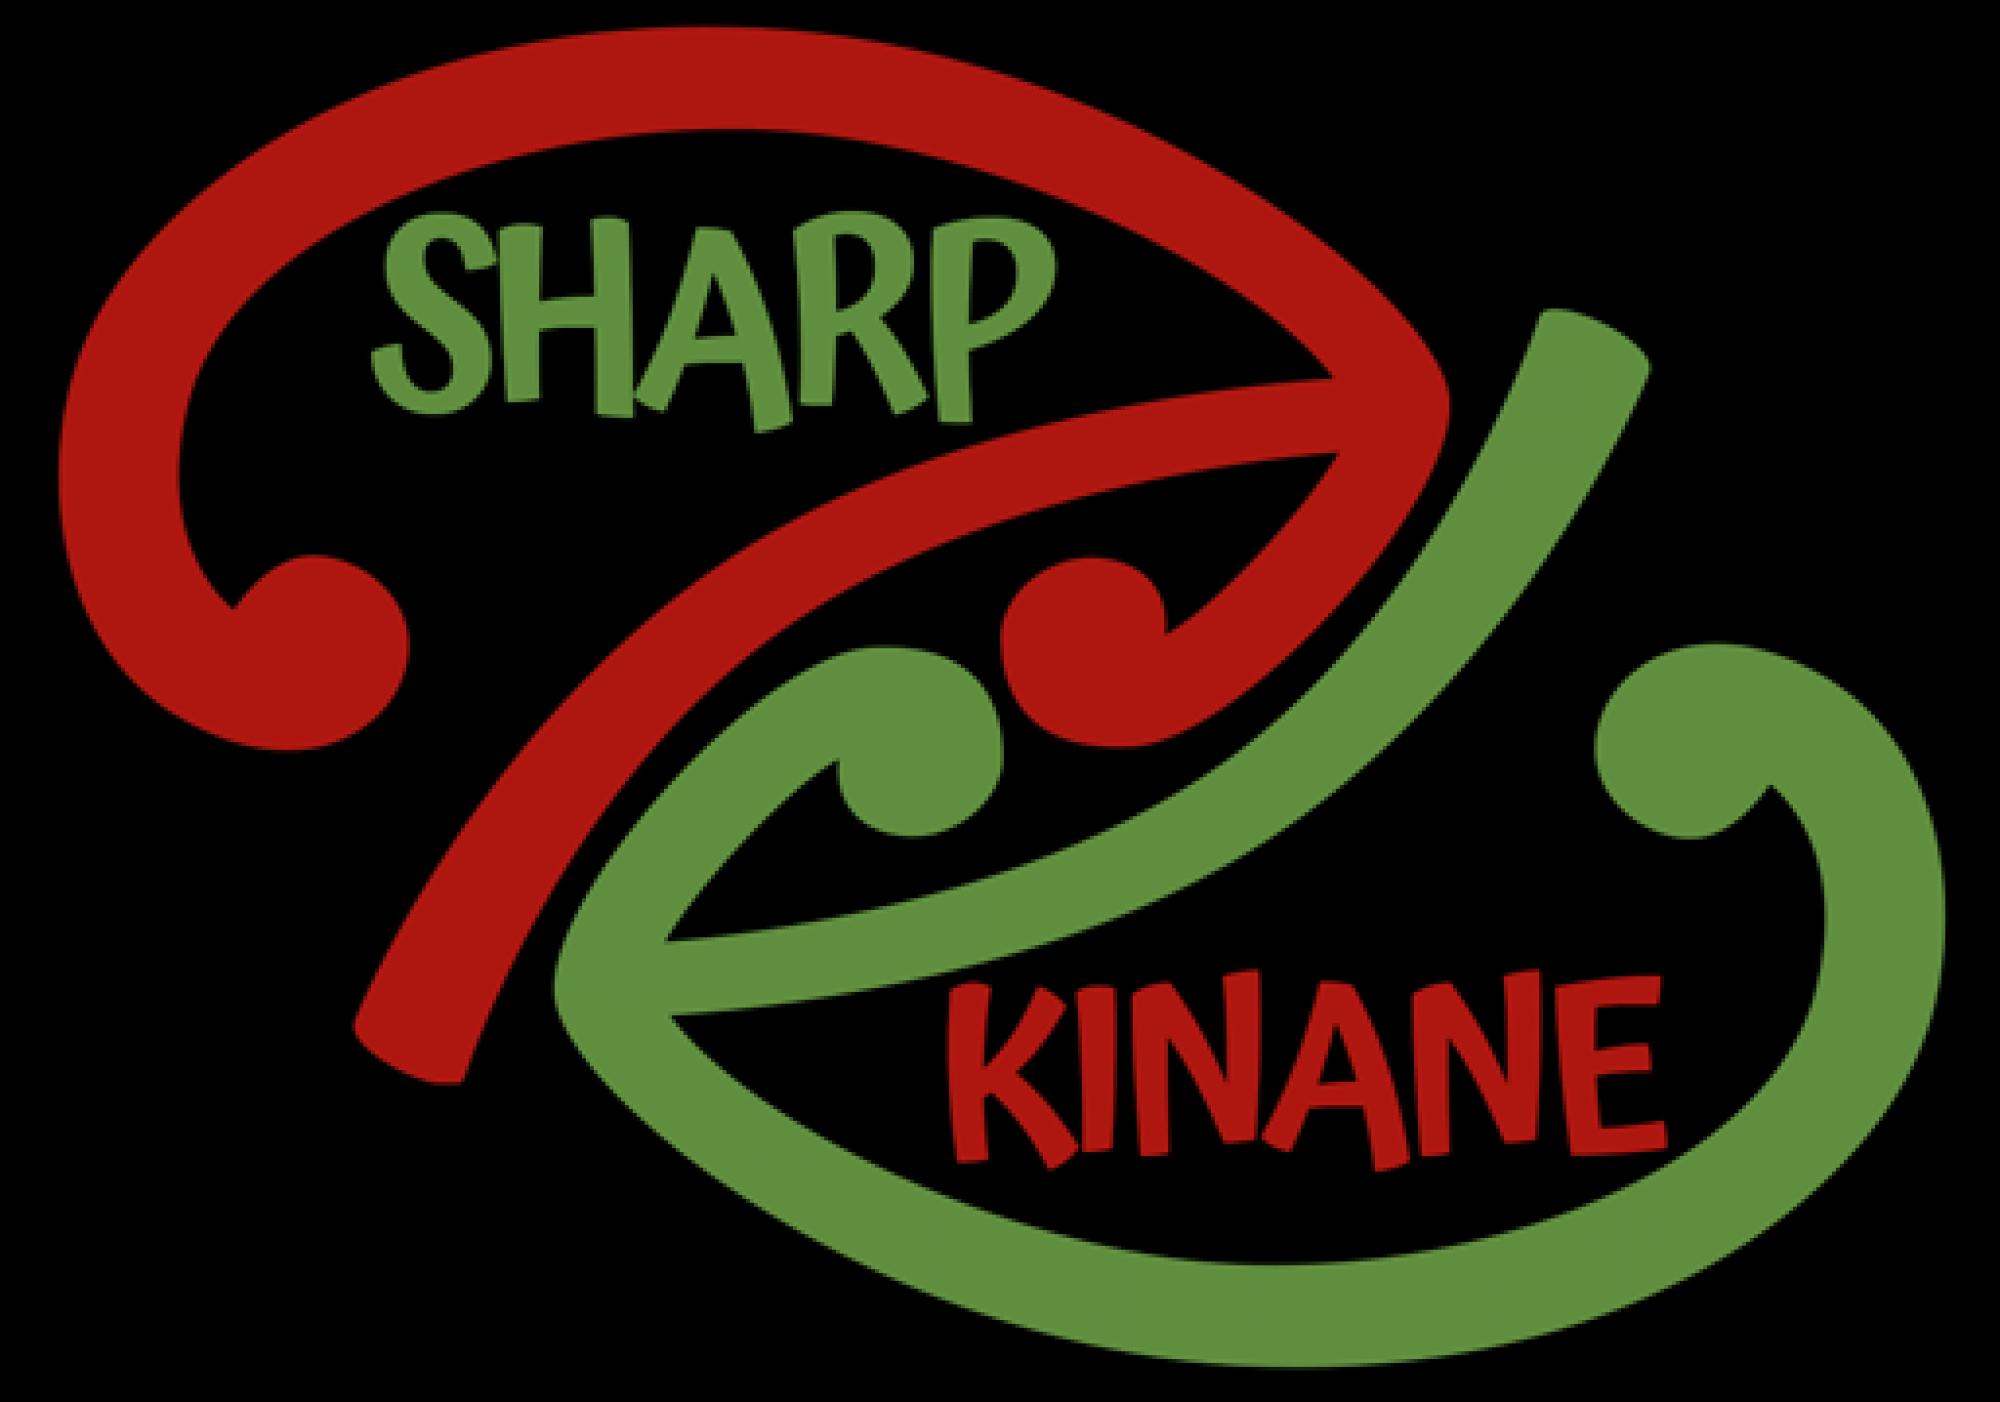 Sharp, Kinane Limited